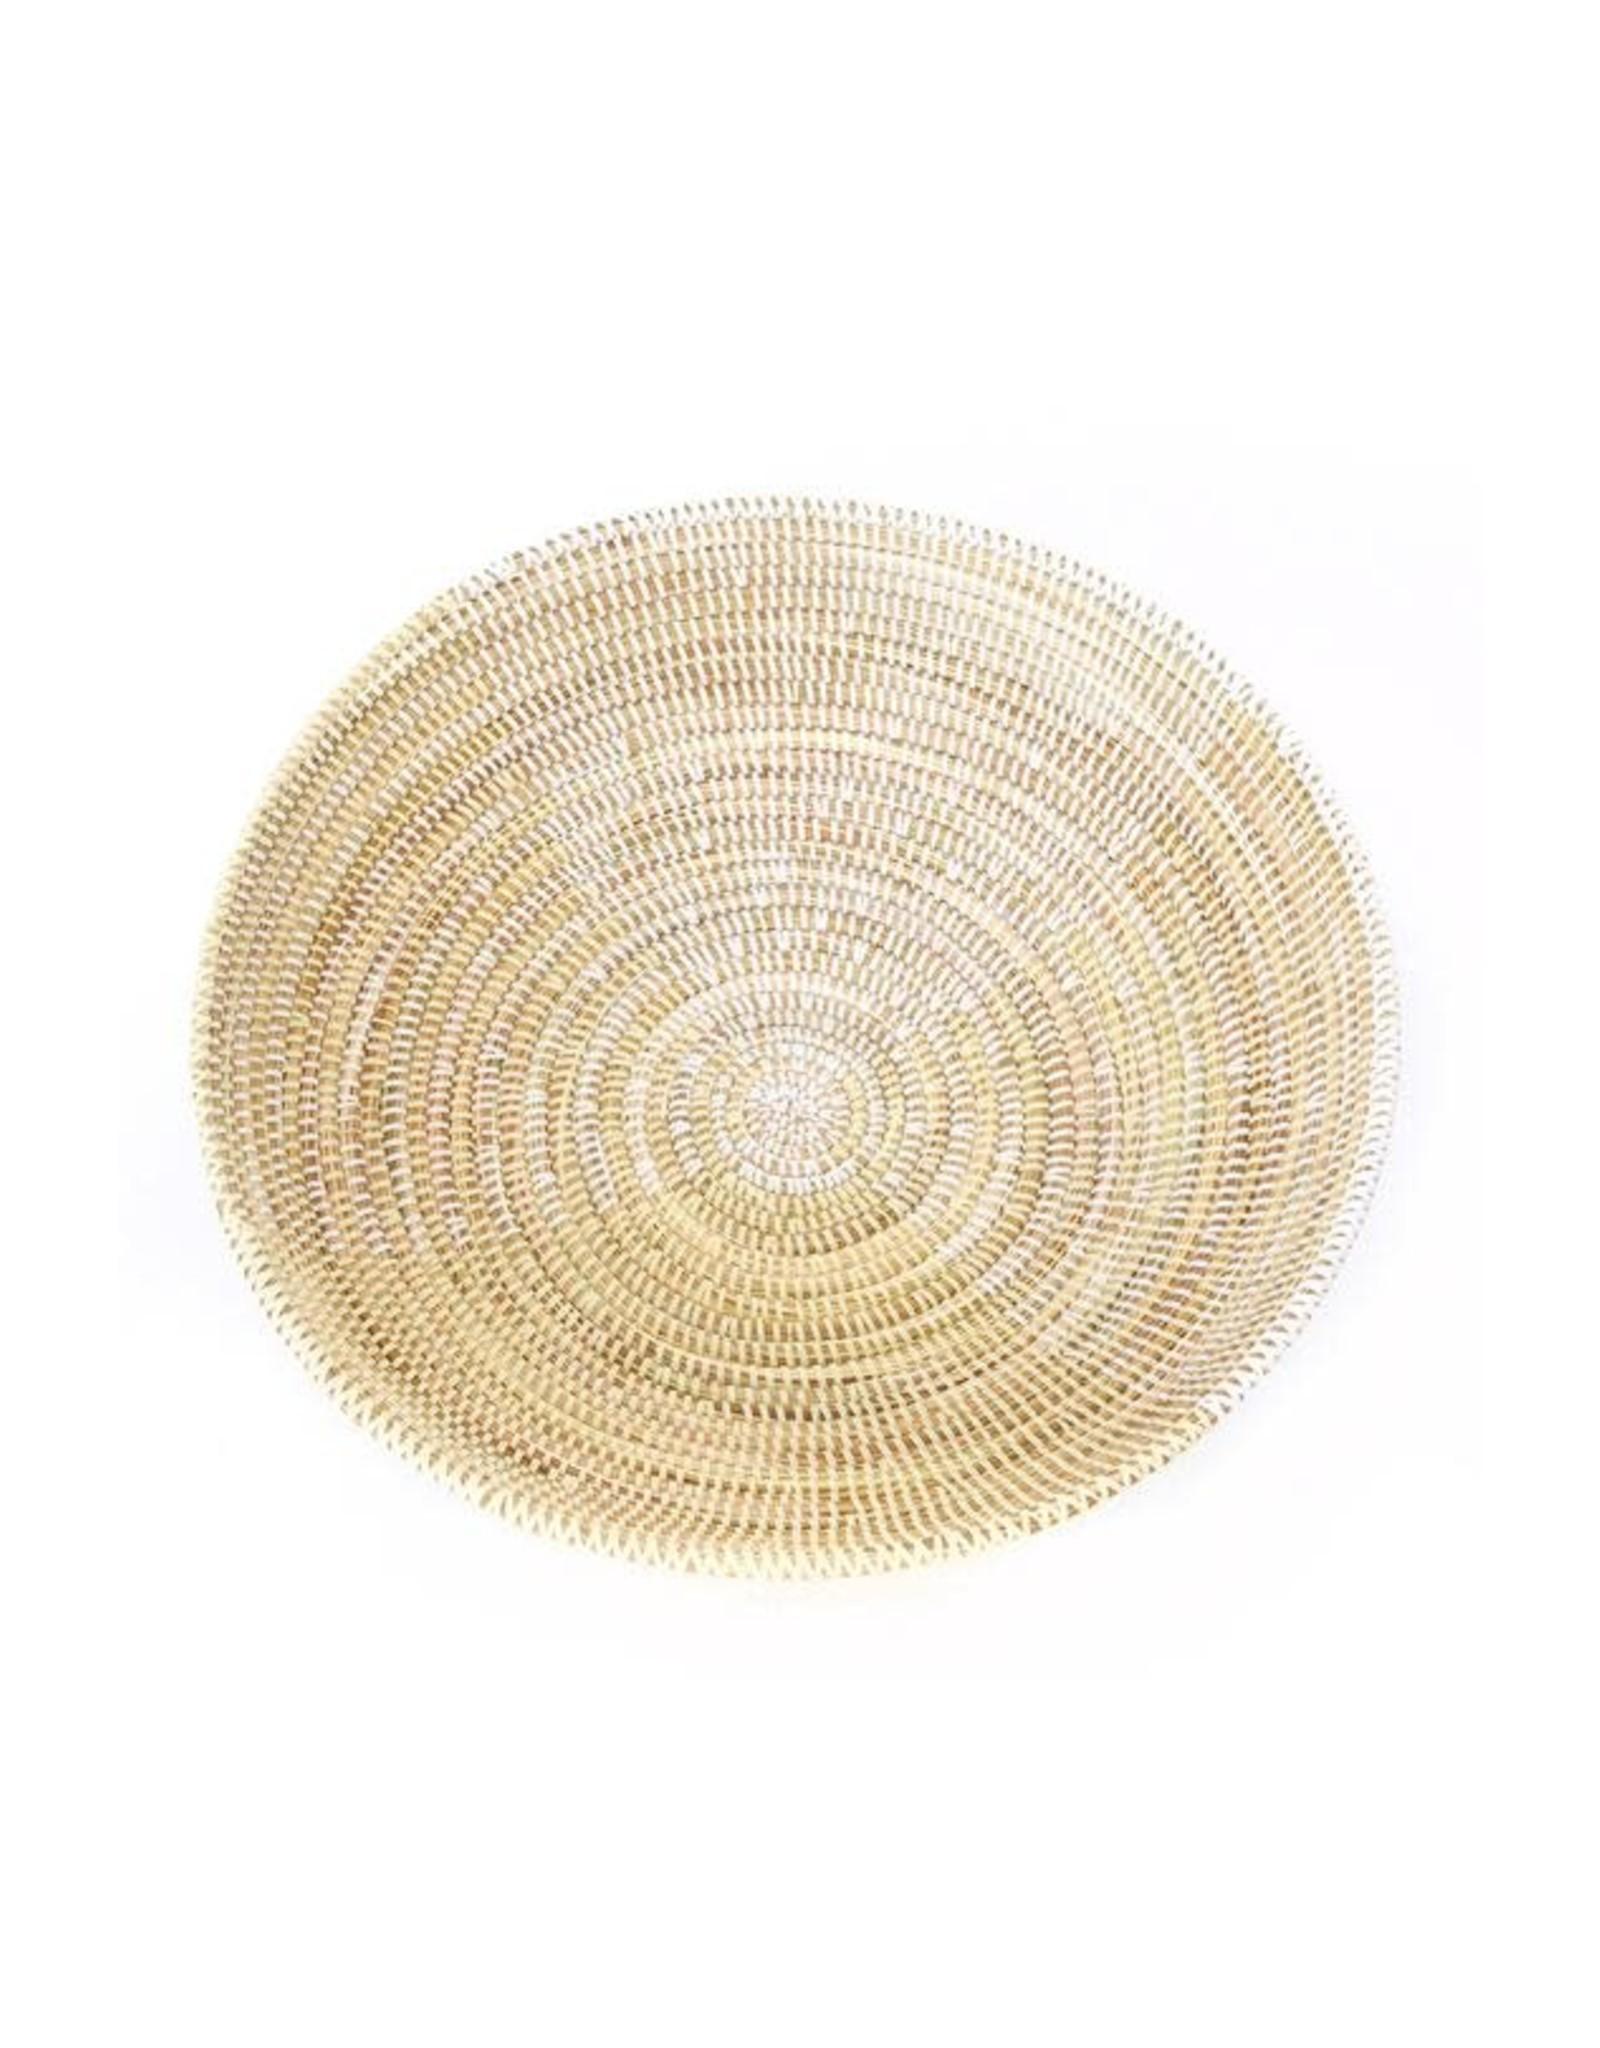 Swahili Wholesale Tabletop Basket, Senegal